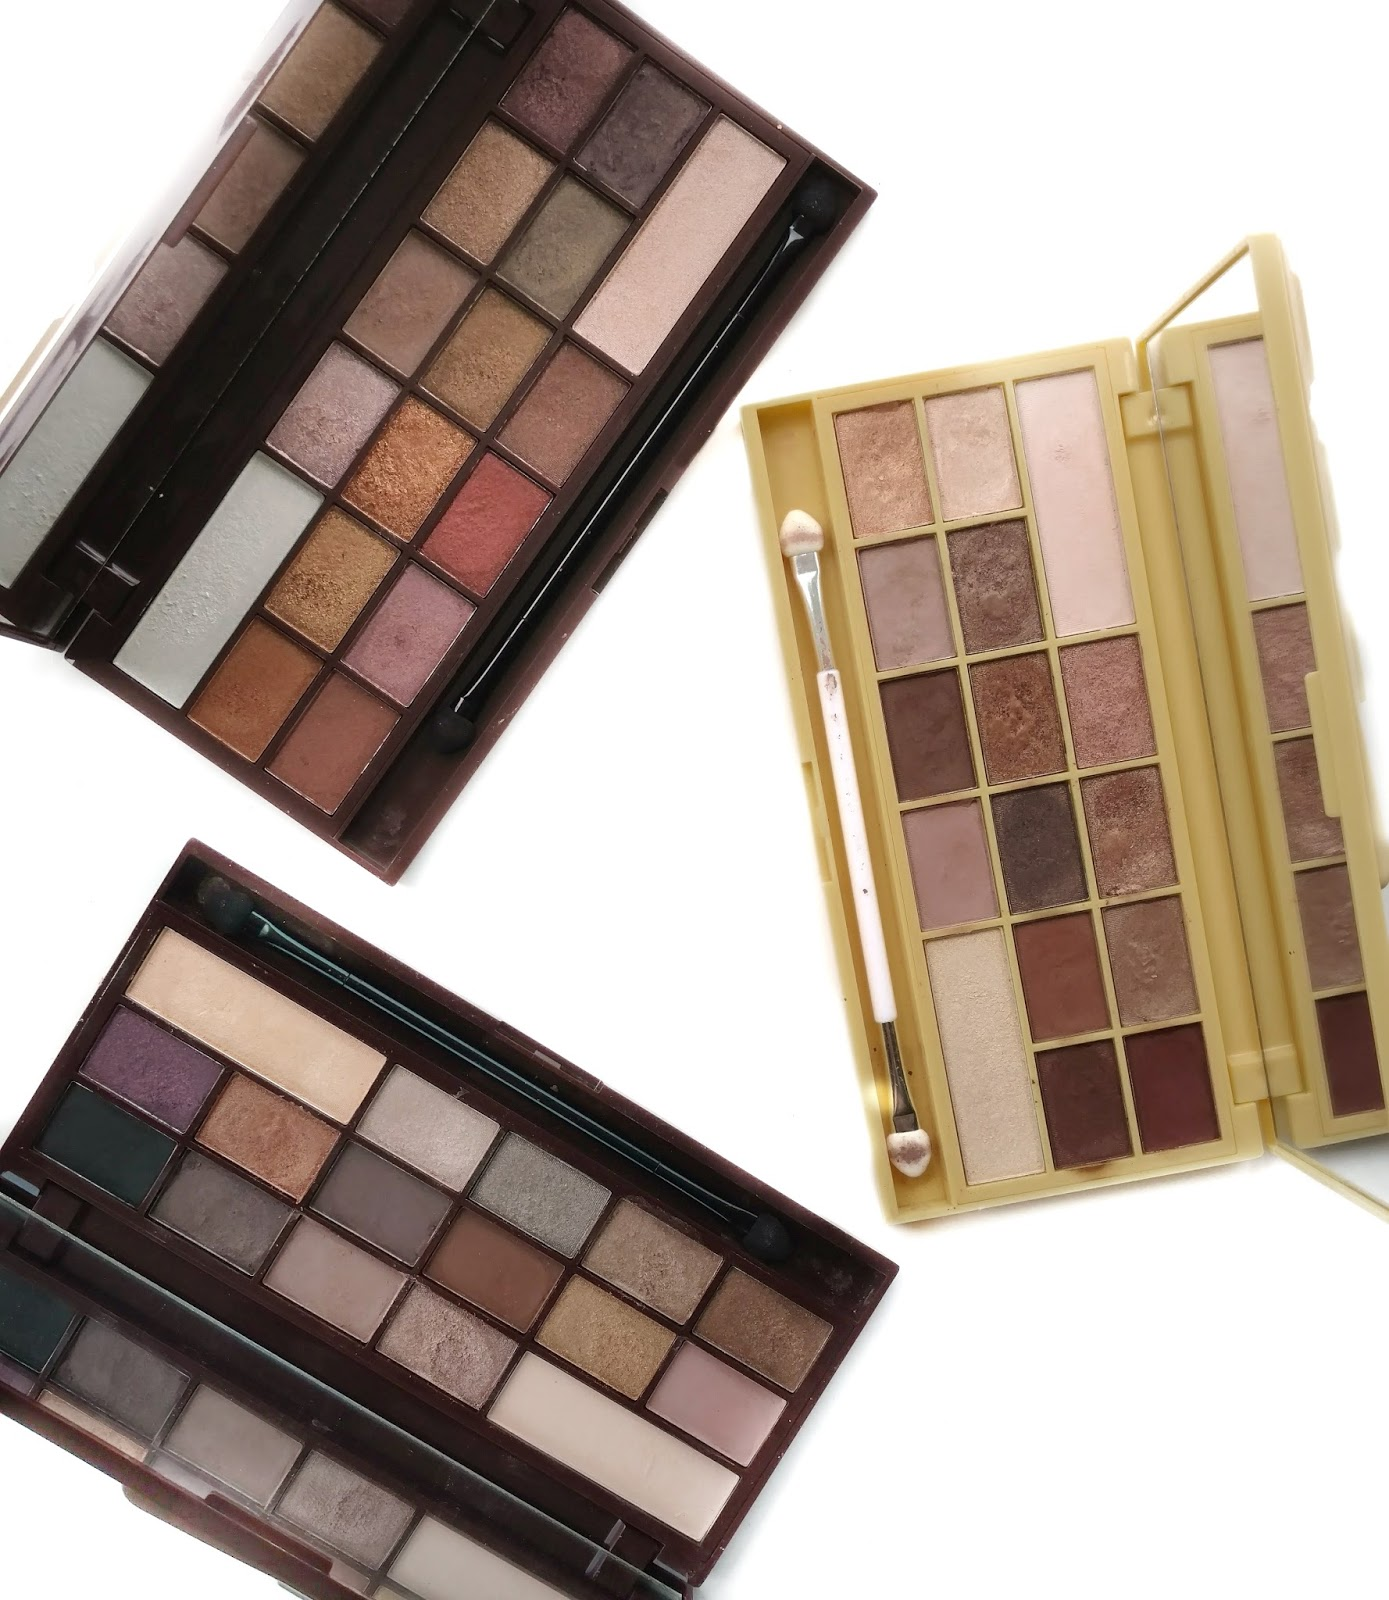 Makeup Revolution Chocolate Palettes